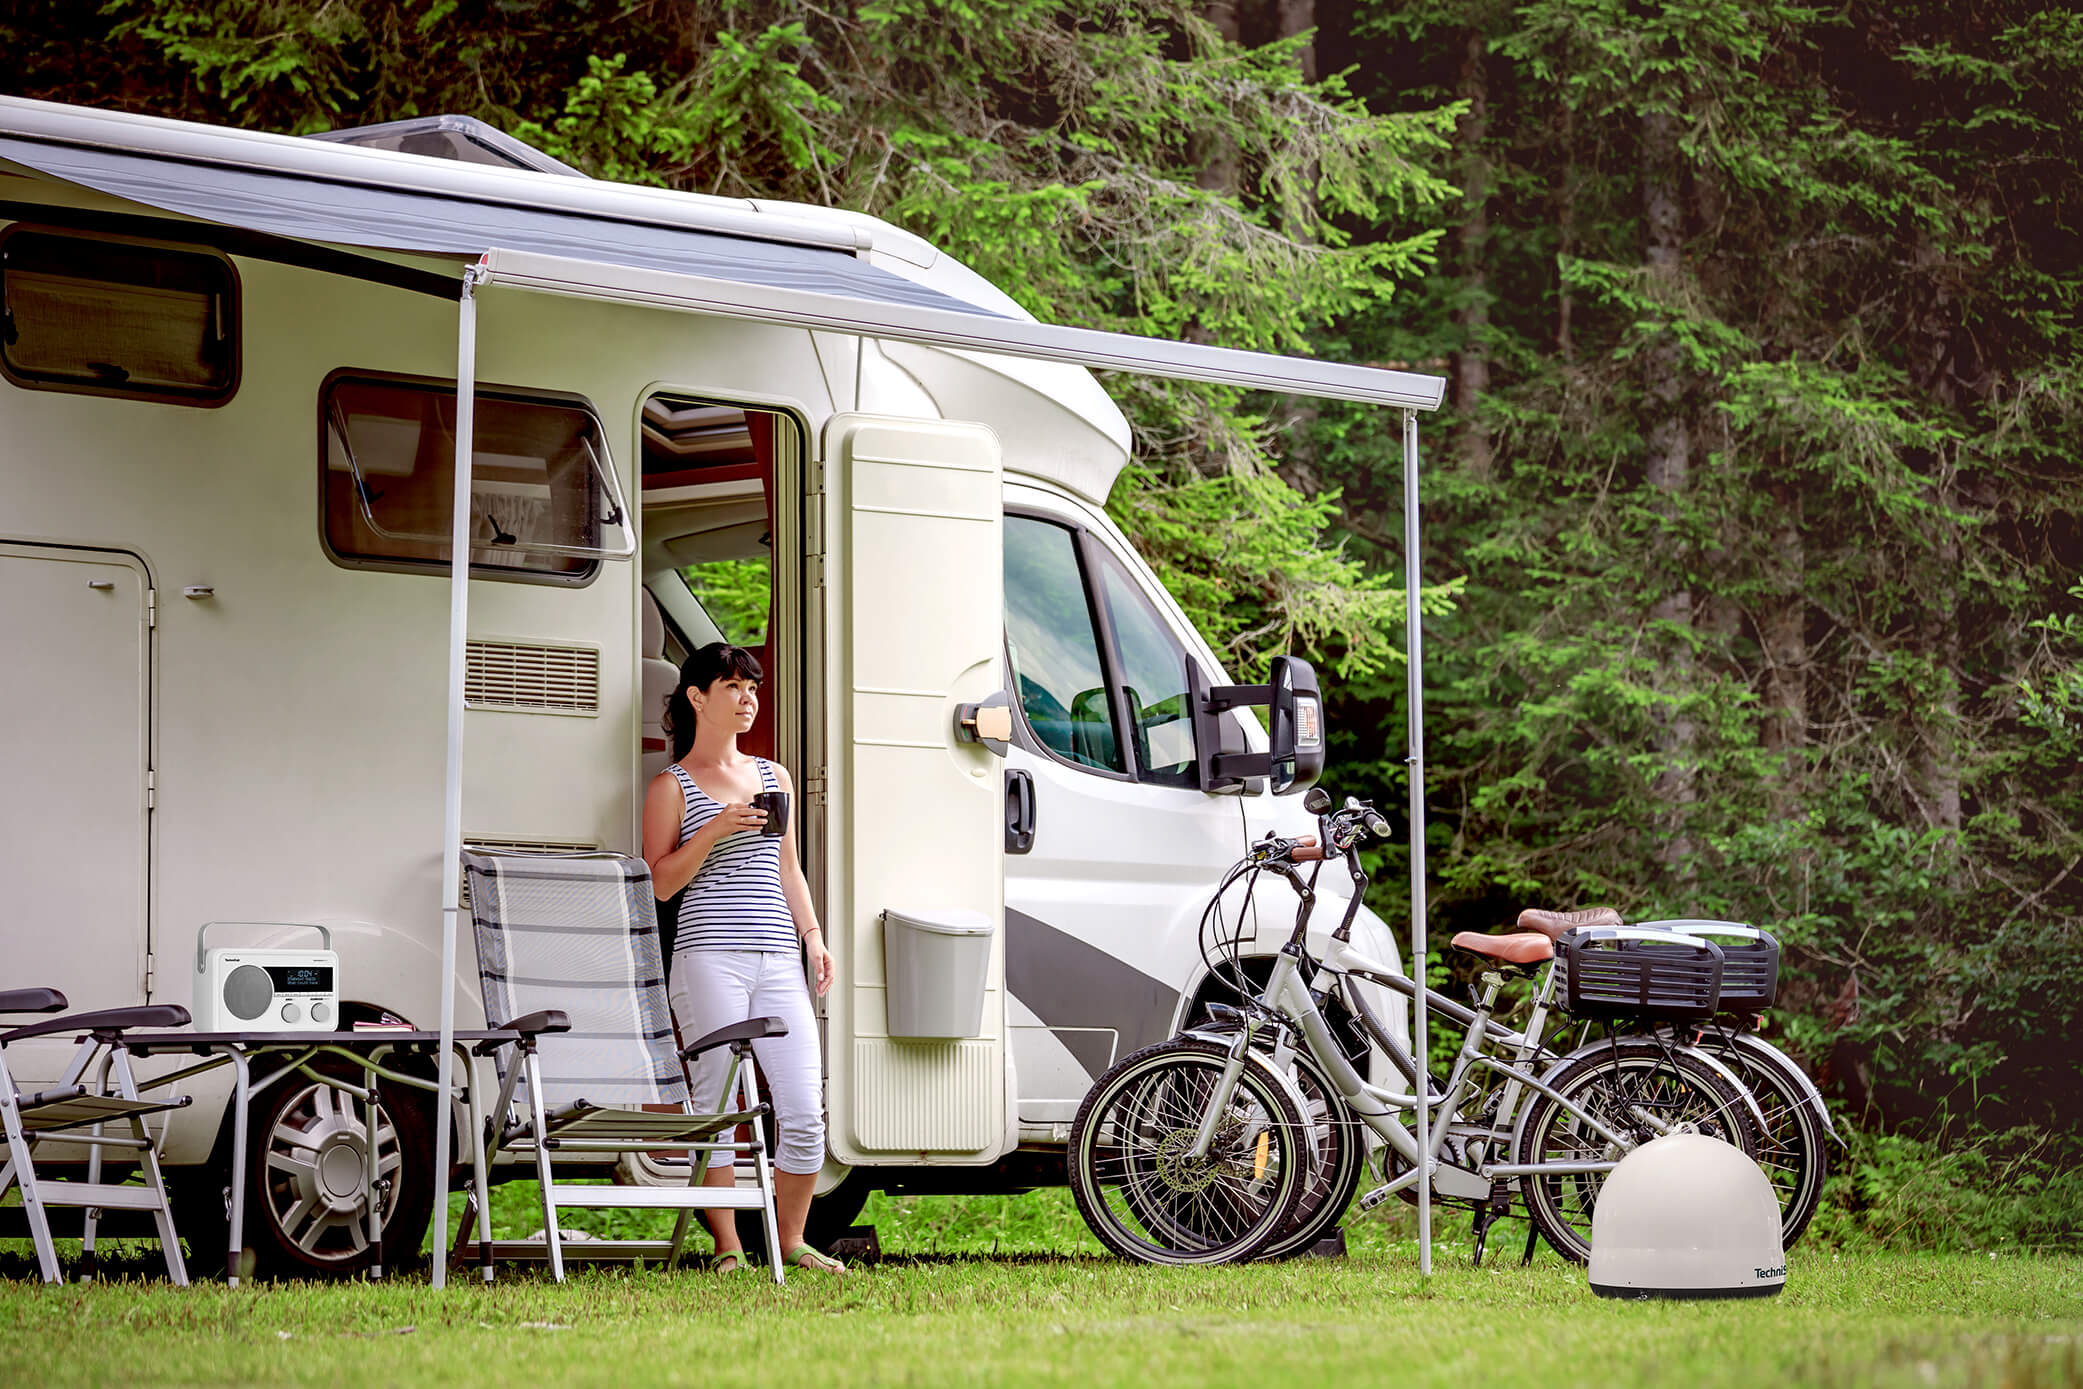 Camping-Ratgeber - TV-Empfang im Wohnmobil